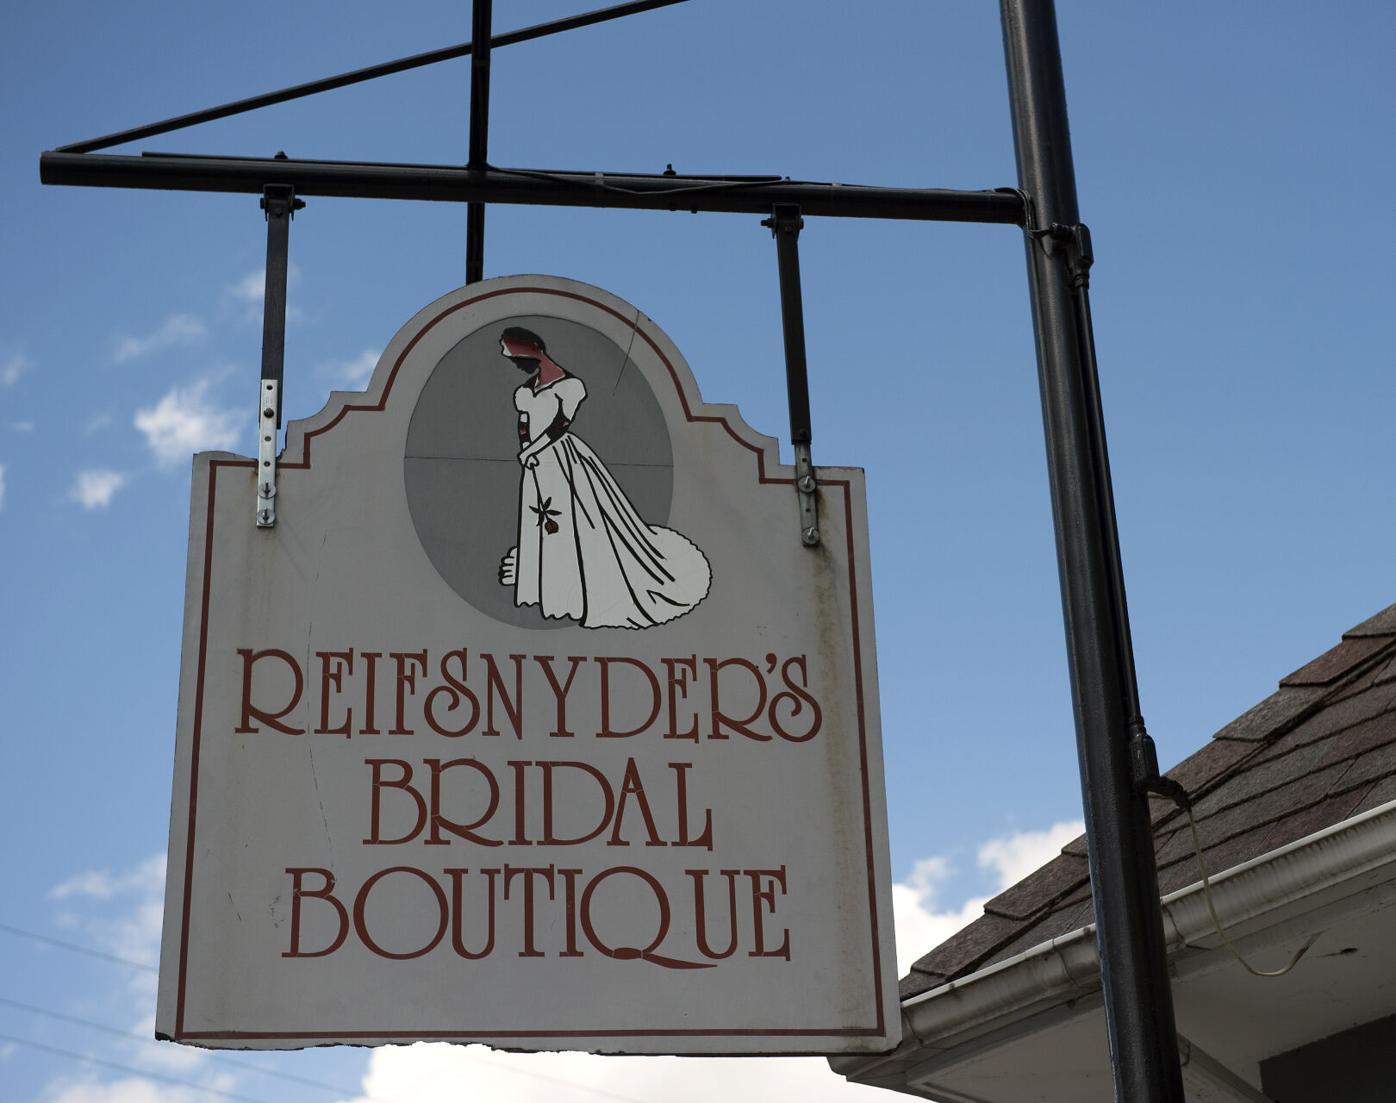 Reifsnyder Bridal Boutique